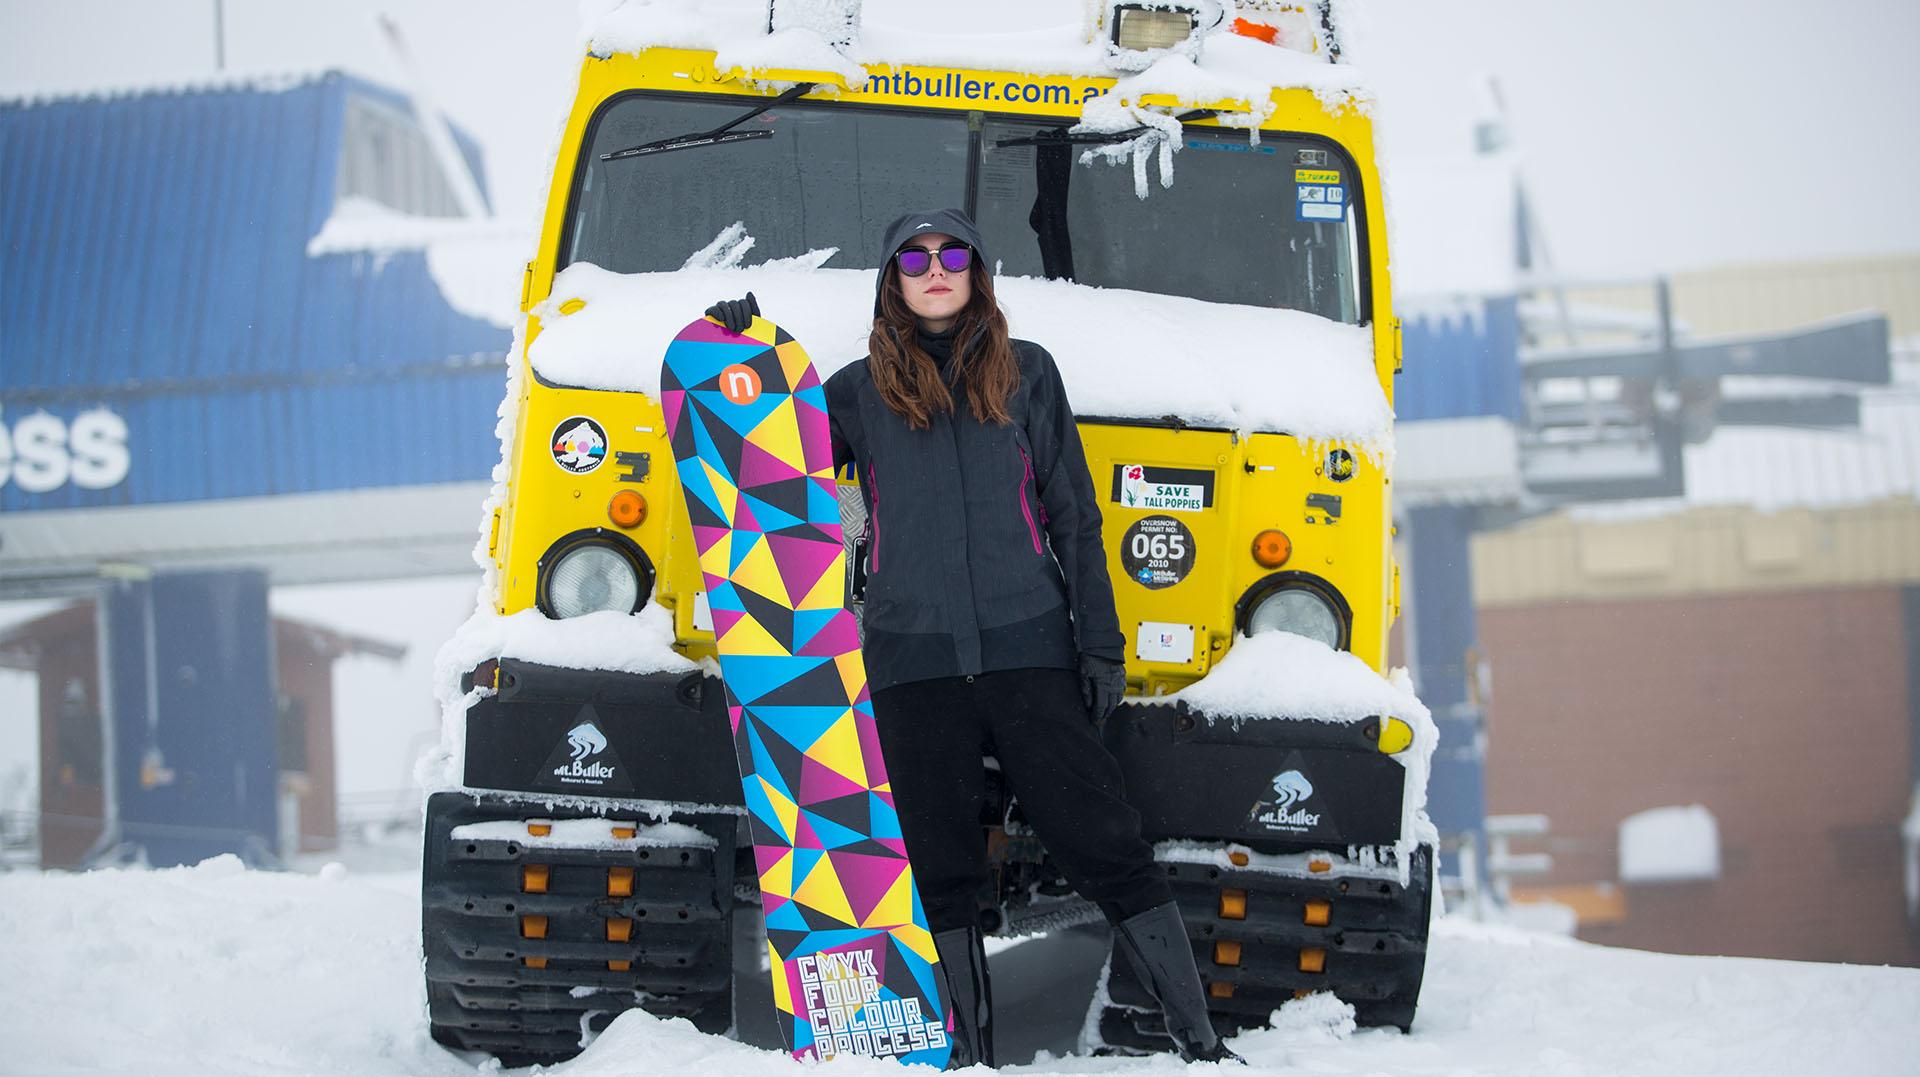 Snowboard 12